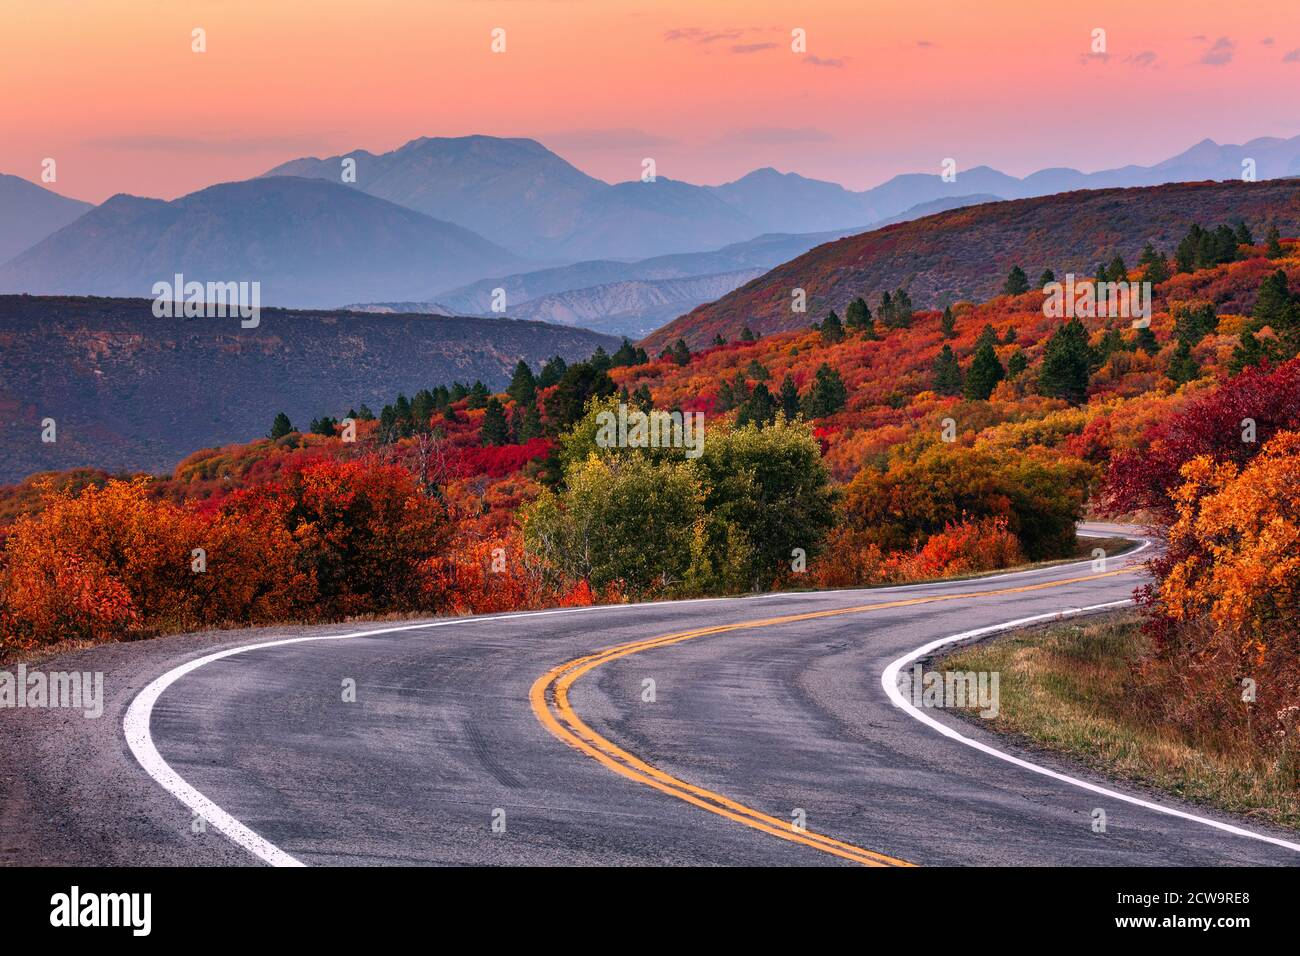 Winding mountain road through a scenic autumn landscape along the West Elk Loop near Gunnison, Colorado. Stock Photo